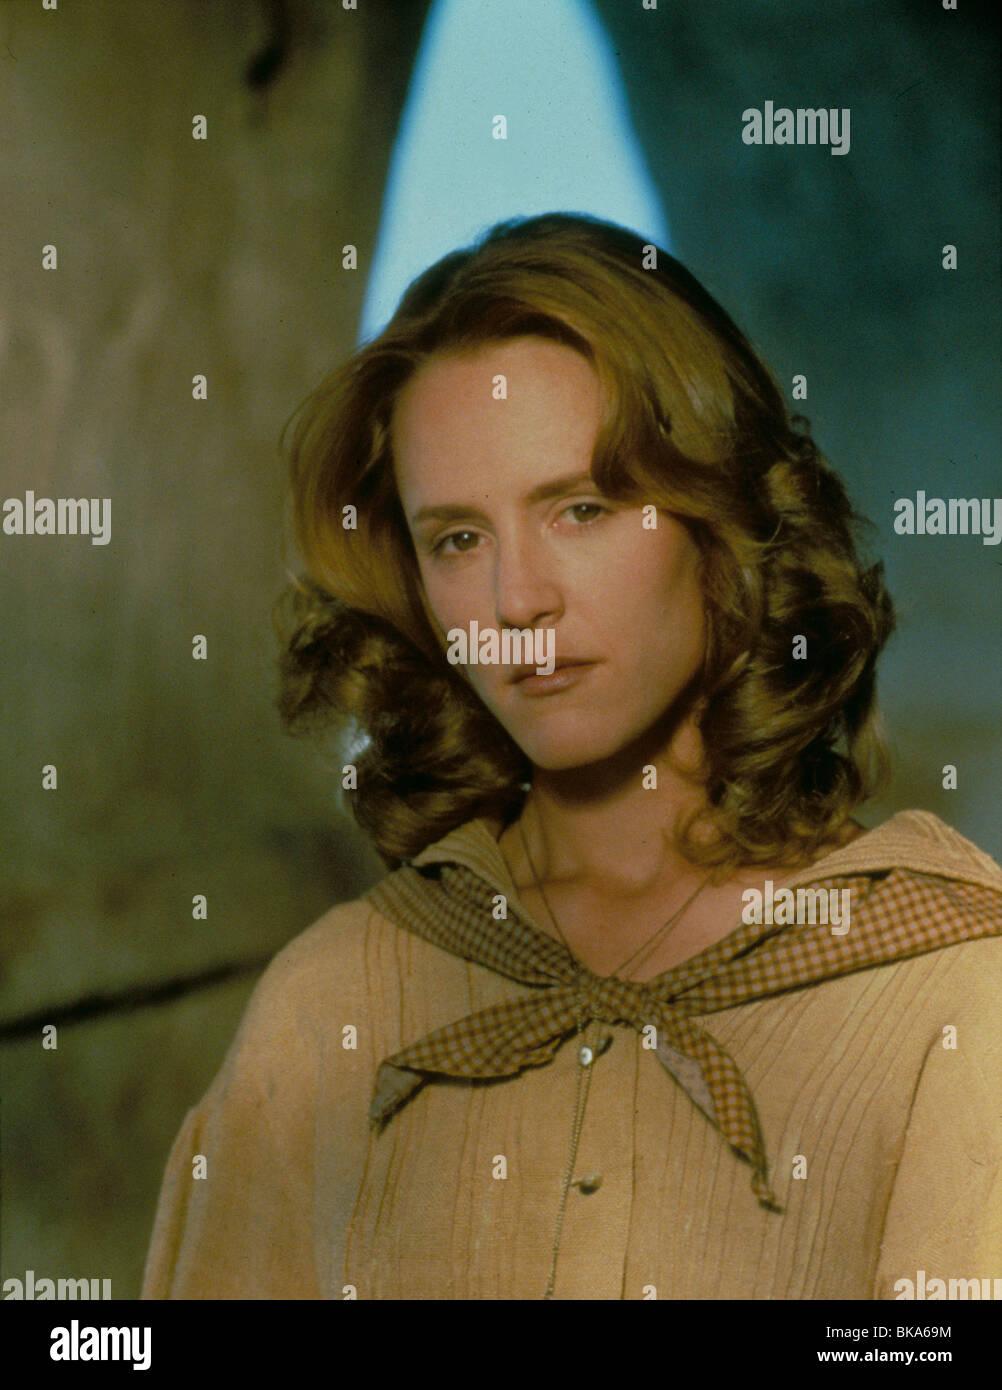 BAD GIRLS (1994) MARY STUART MASTERSON BDGS 008 Stock Photo